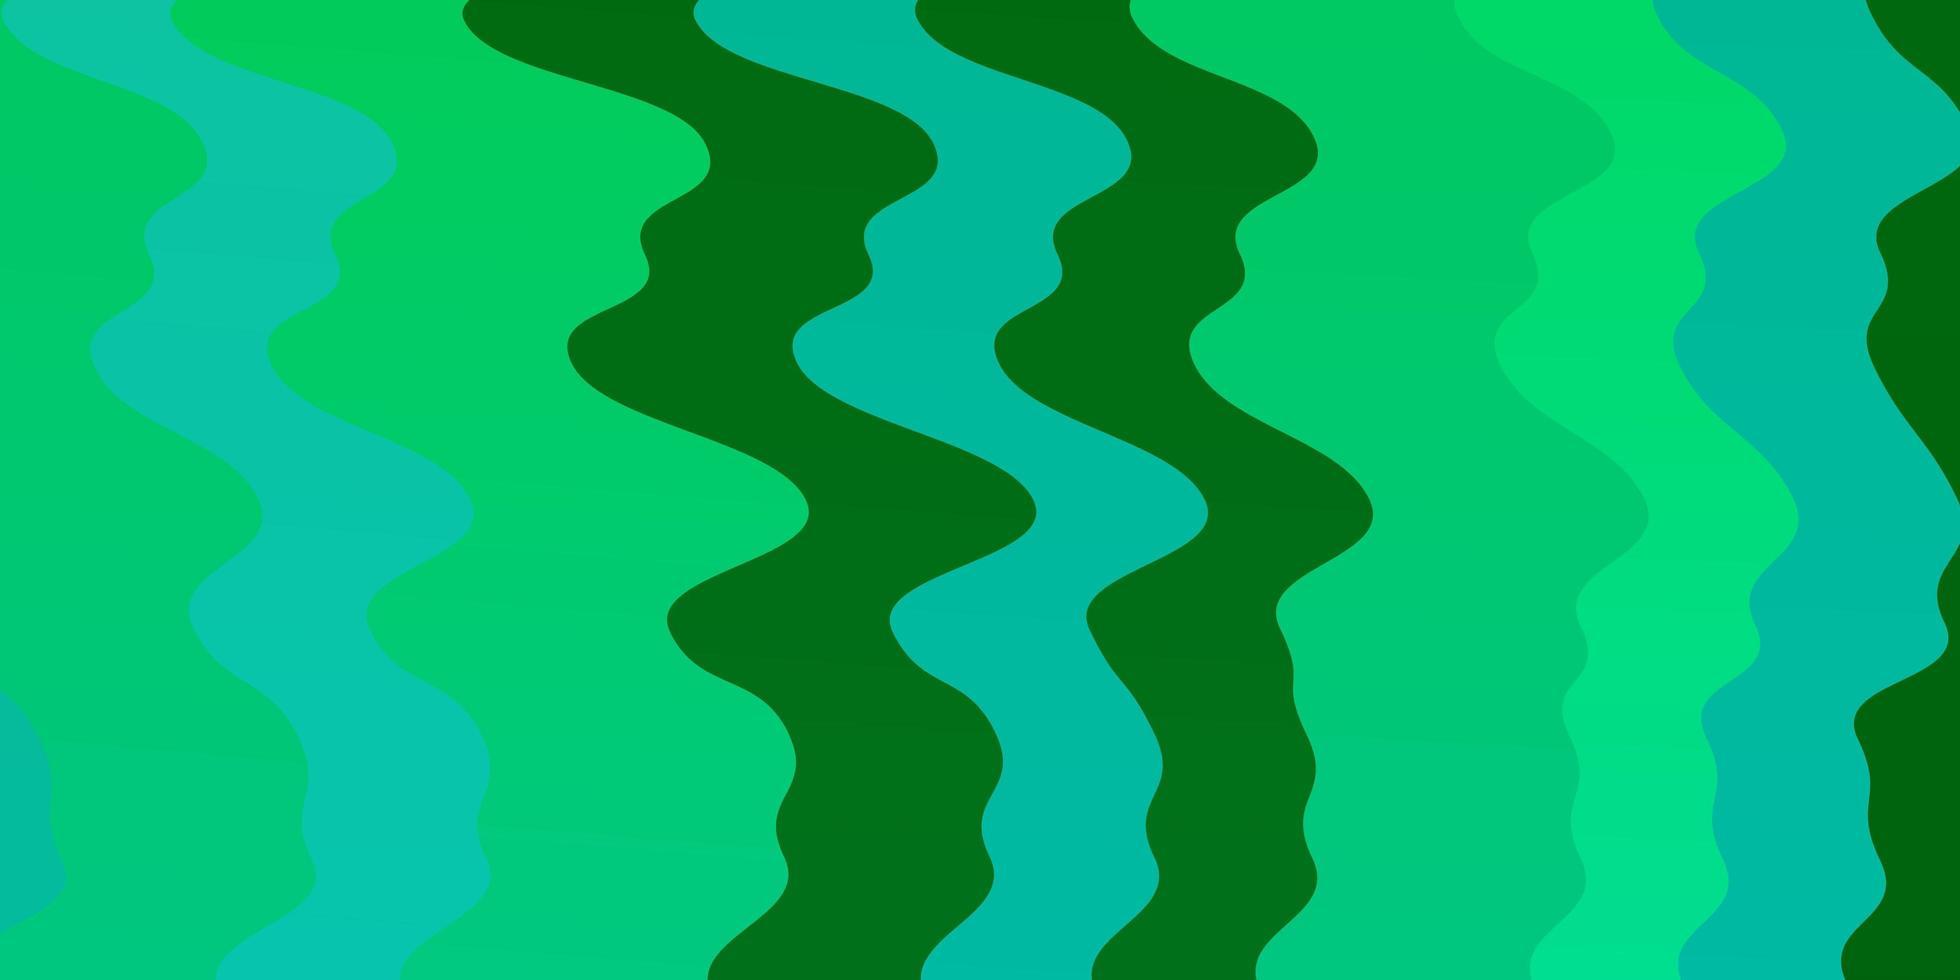 lichtgroene vector achtergrond met curven.